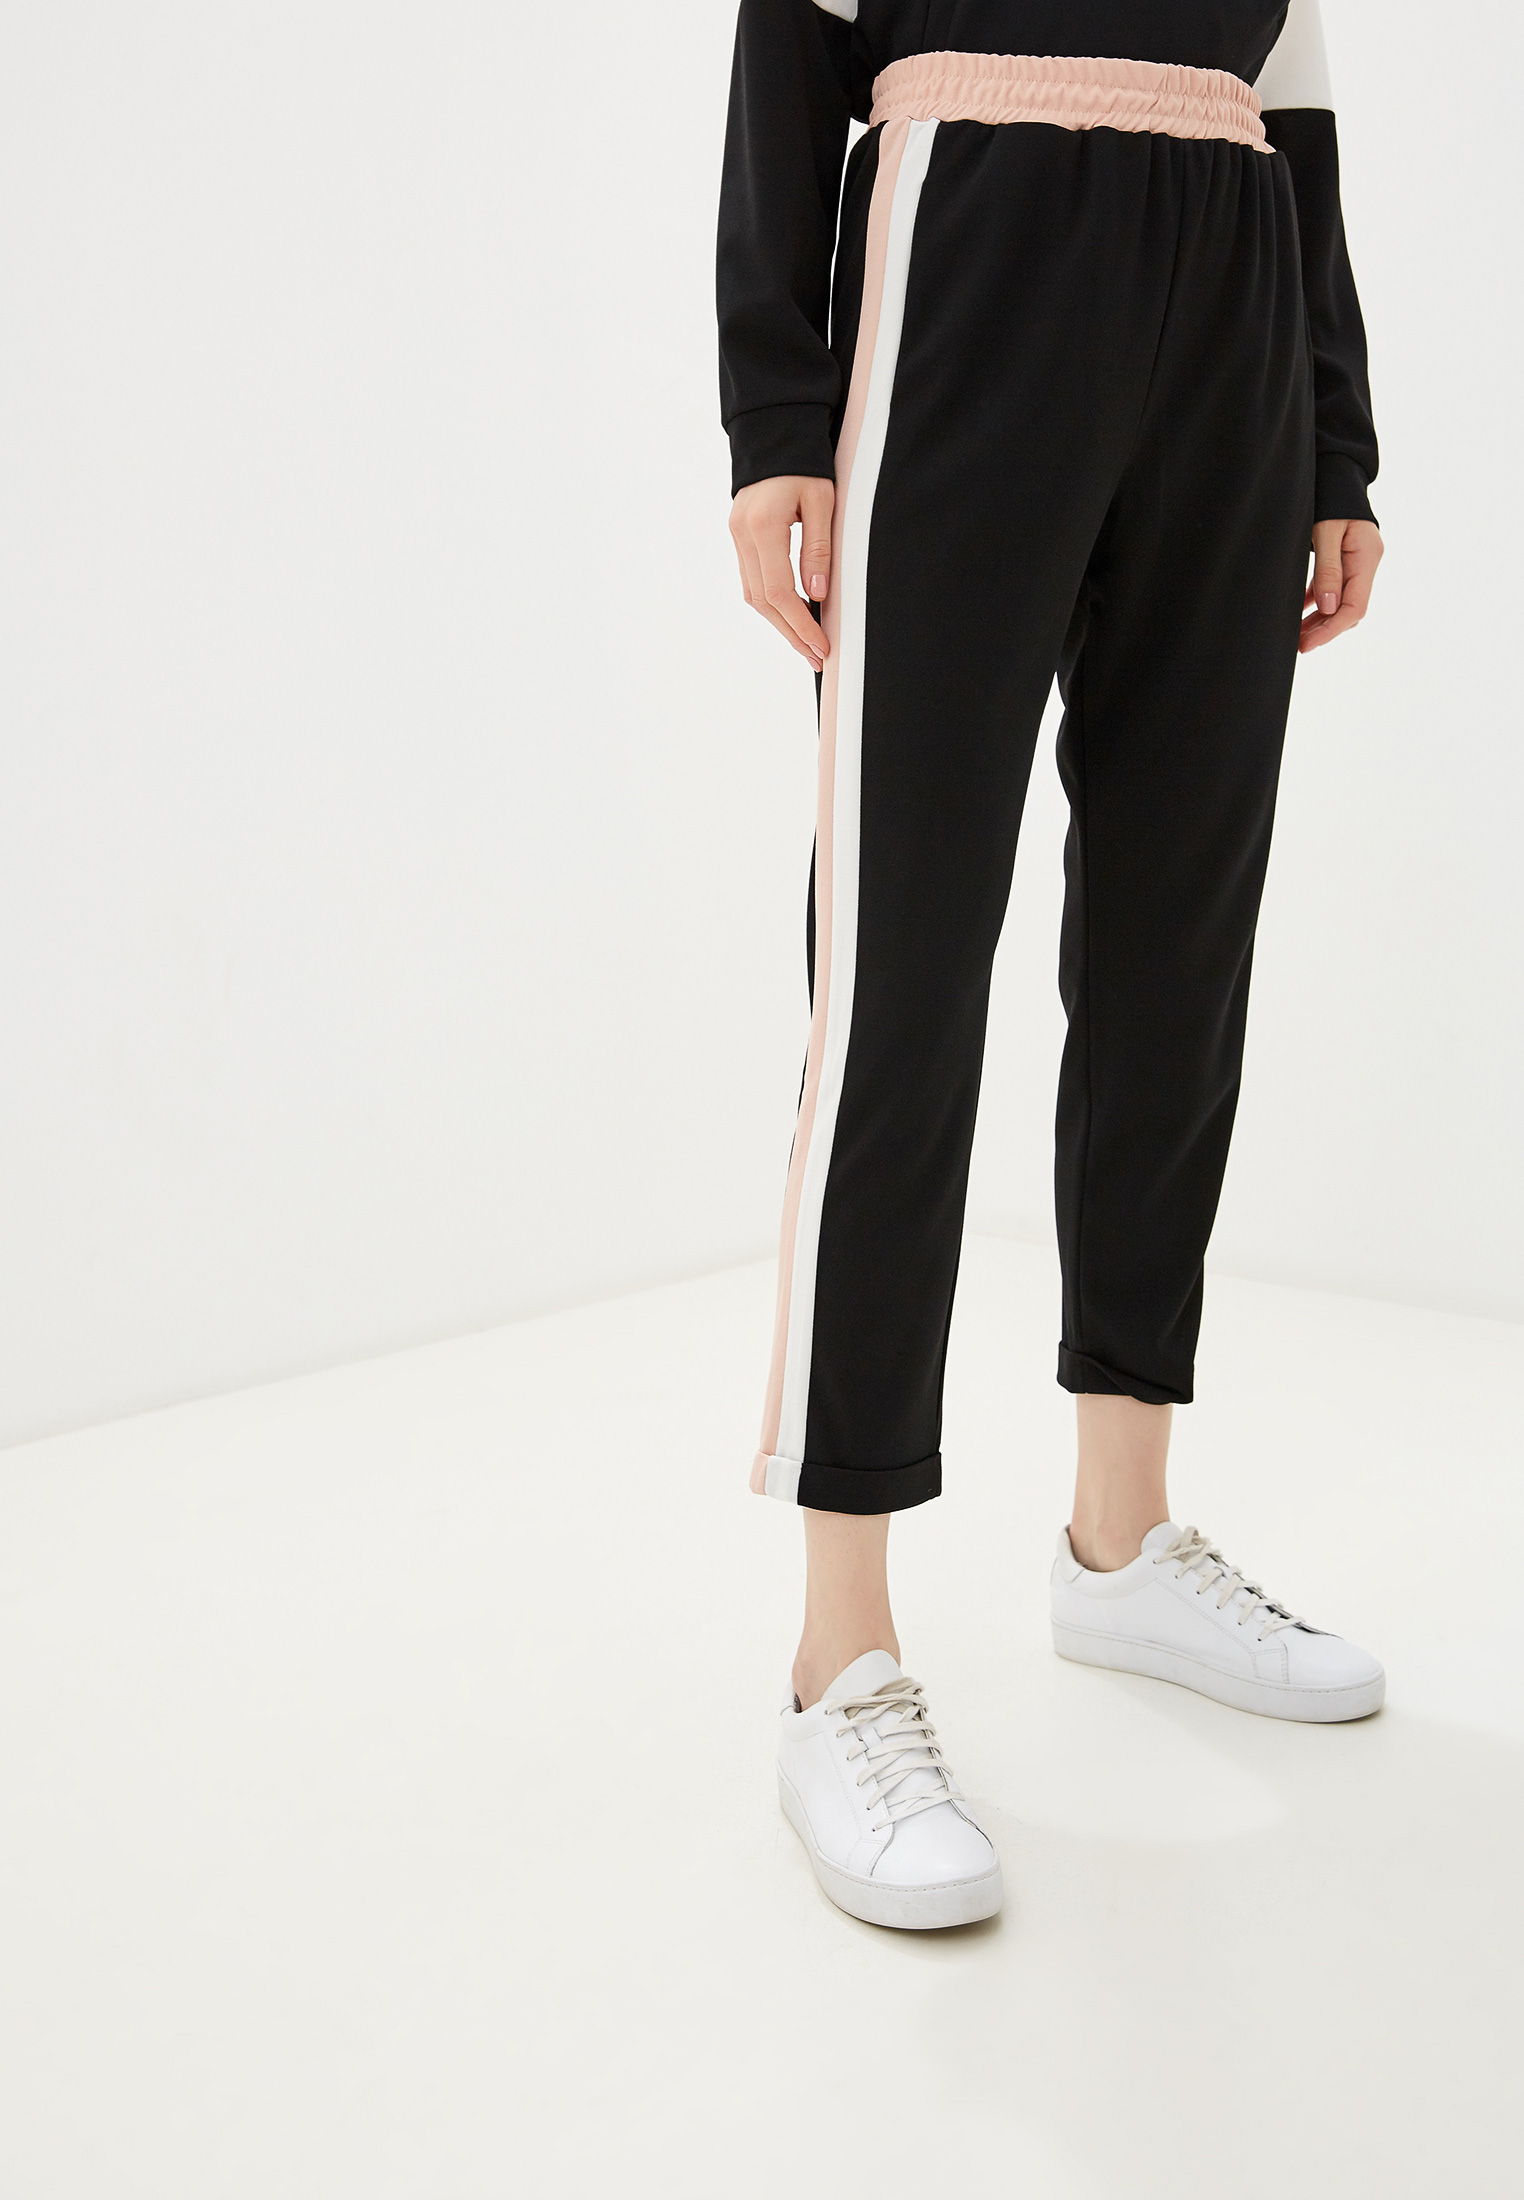 Женские спортивные брюки Massimiliano Bini LA119-5123